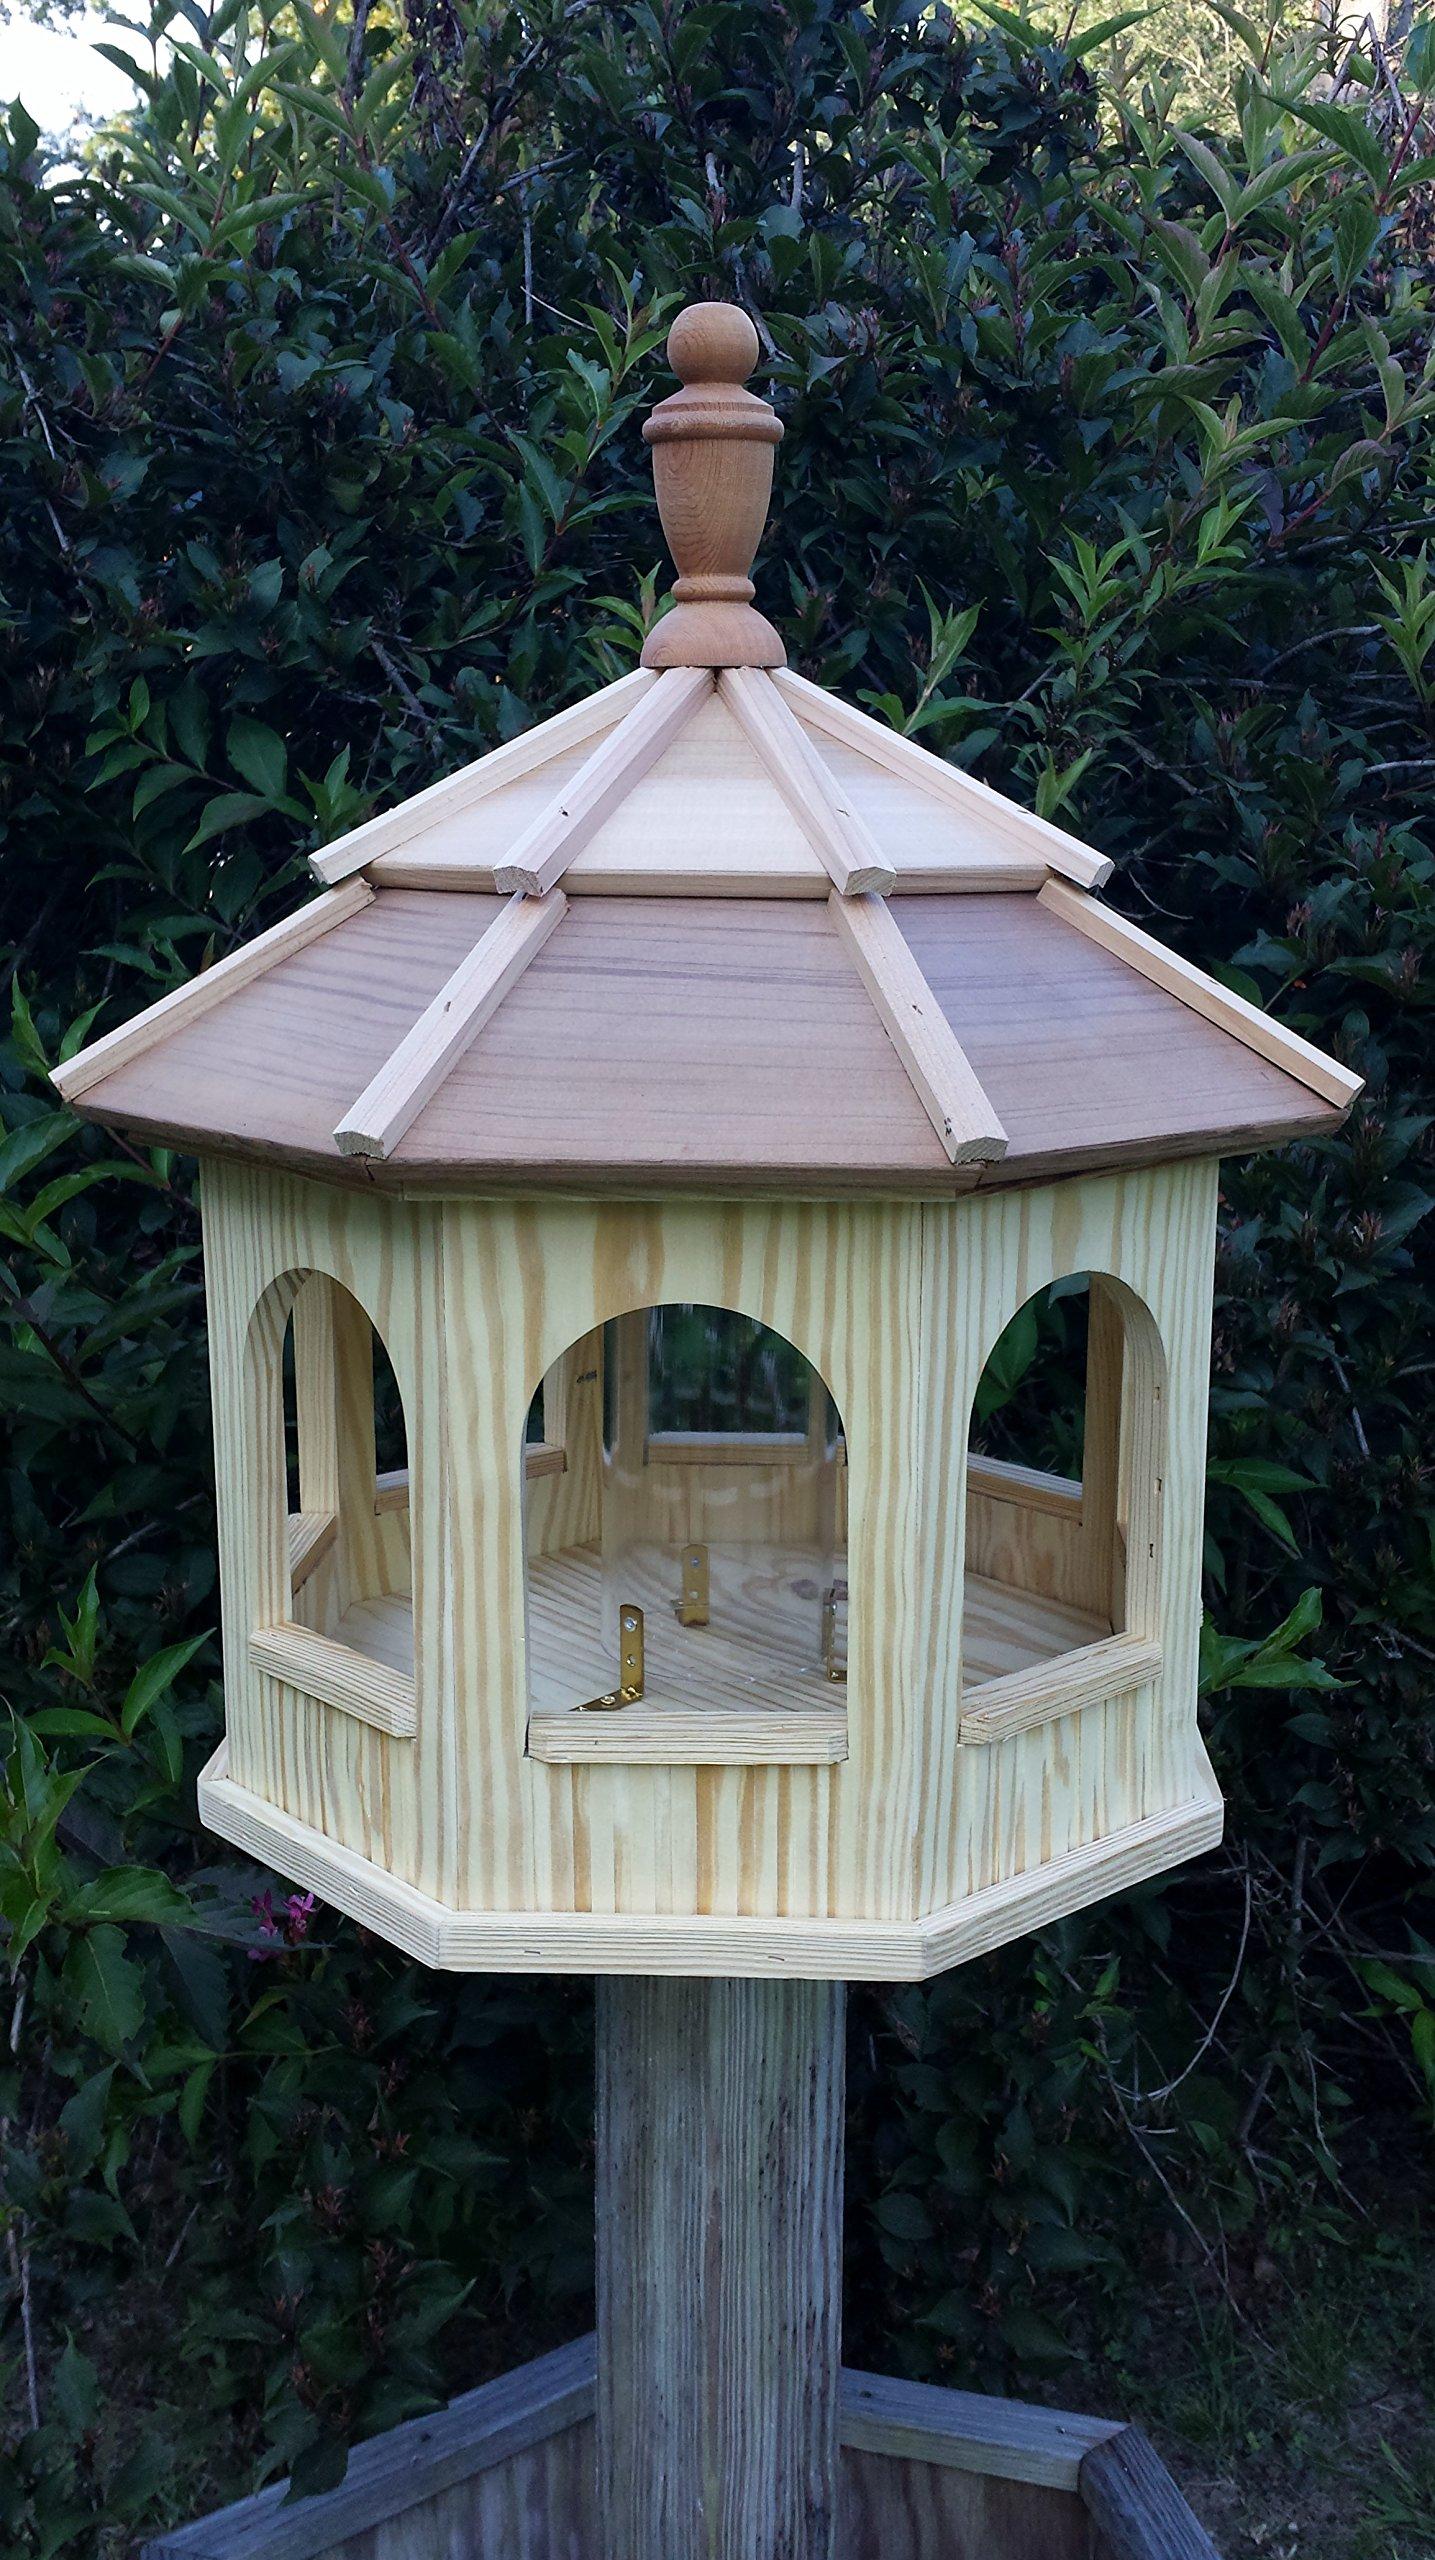 Wooden Gazebo Birdfeeder (Large) by Amish Crafted